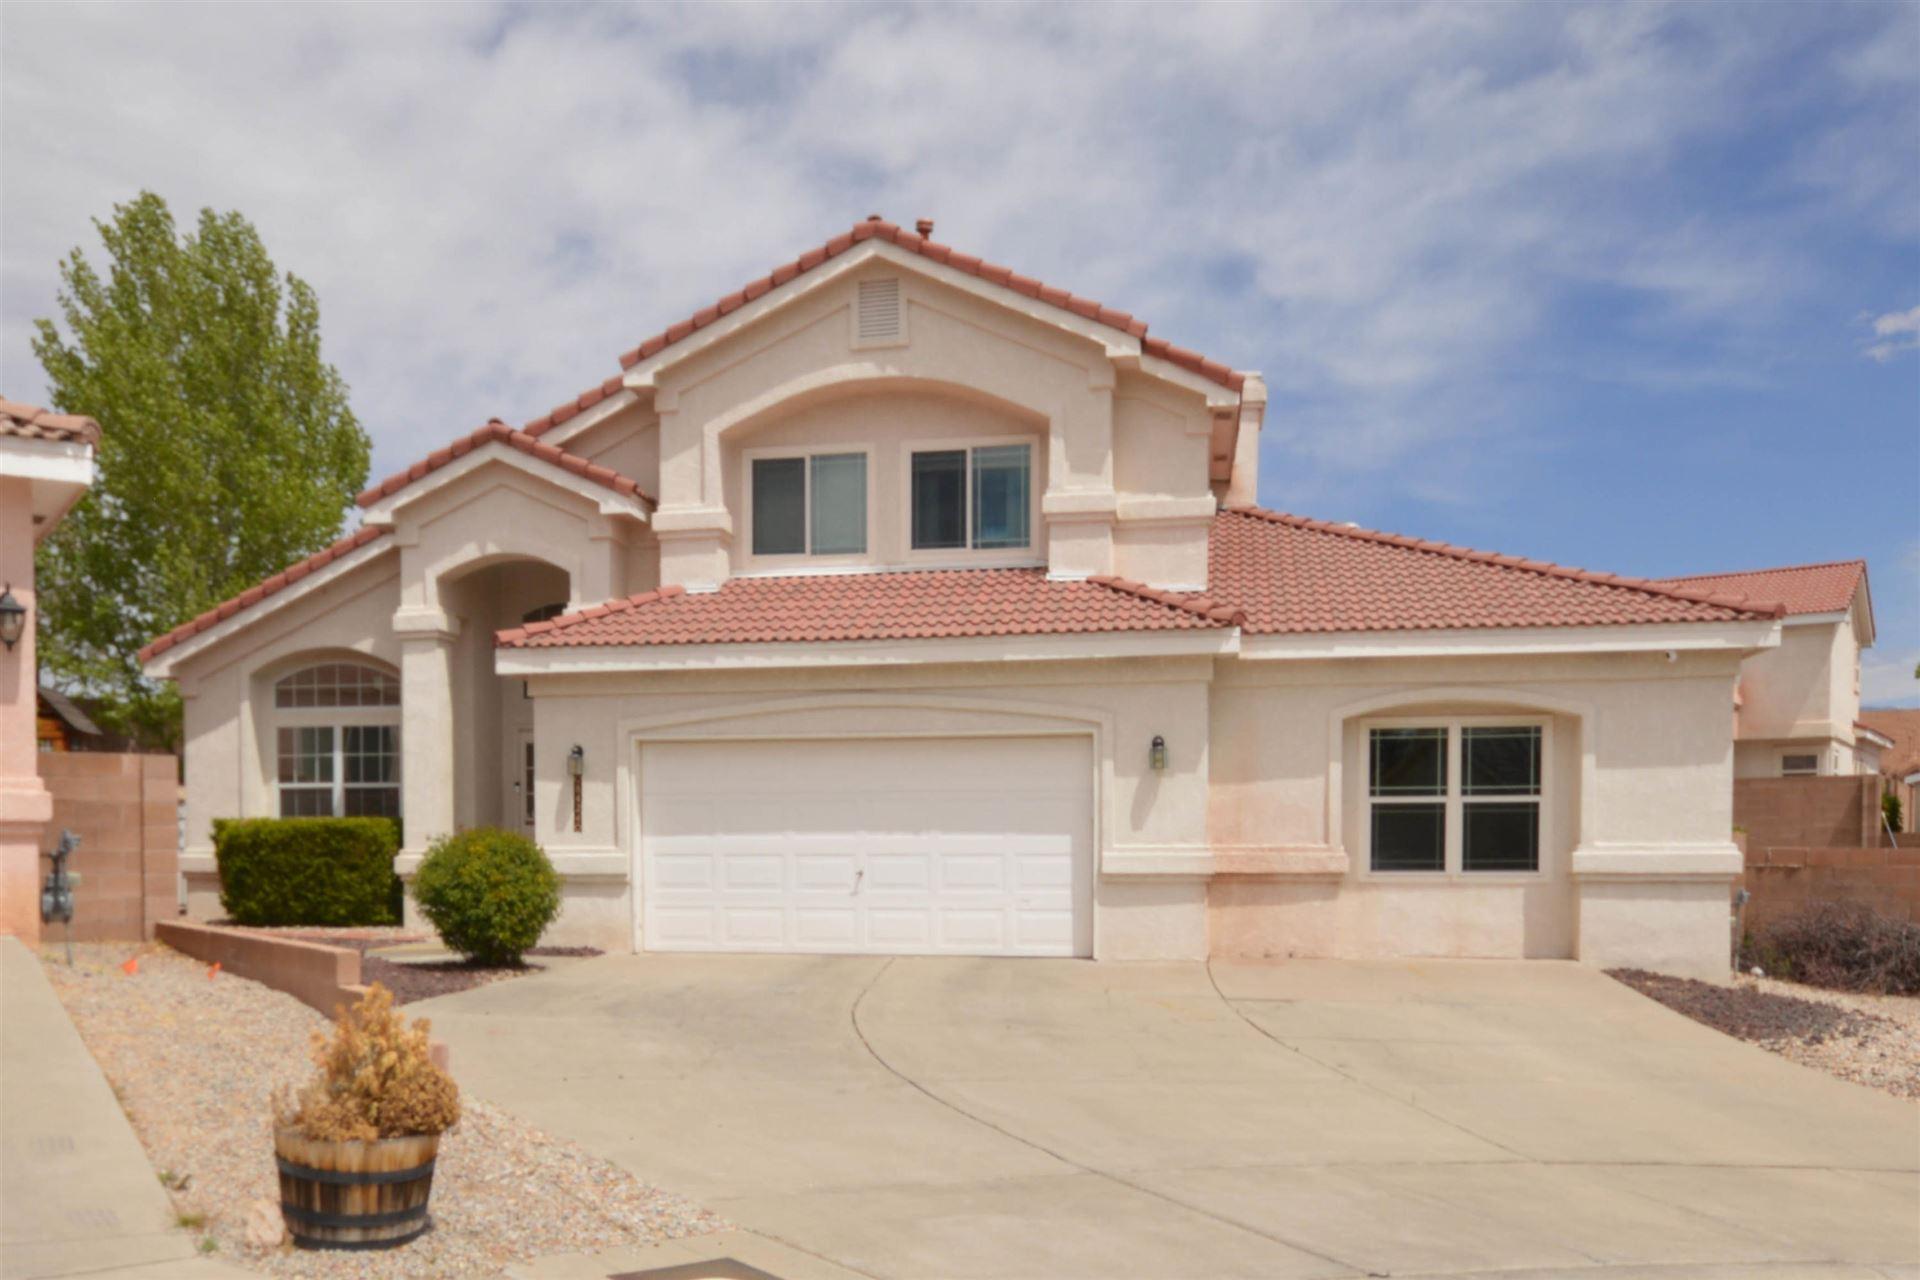 Photo of 8424 LOS REYES Court NW, Albuquerque, NM 87120 (MLS # 989894)